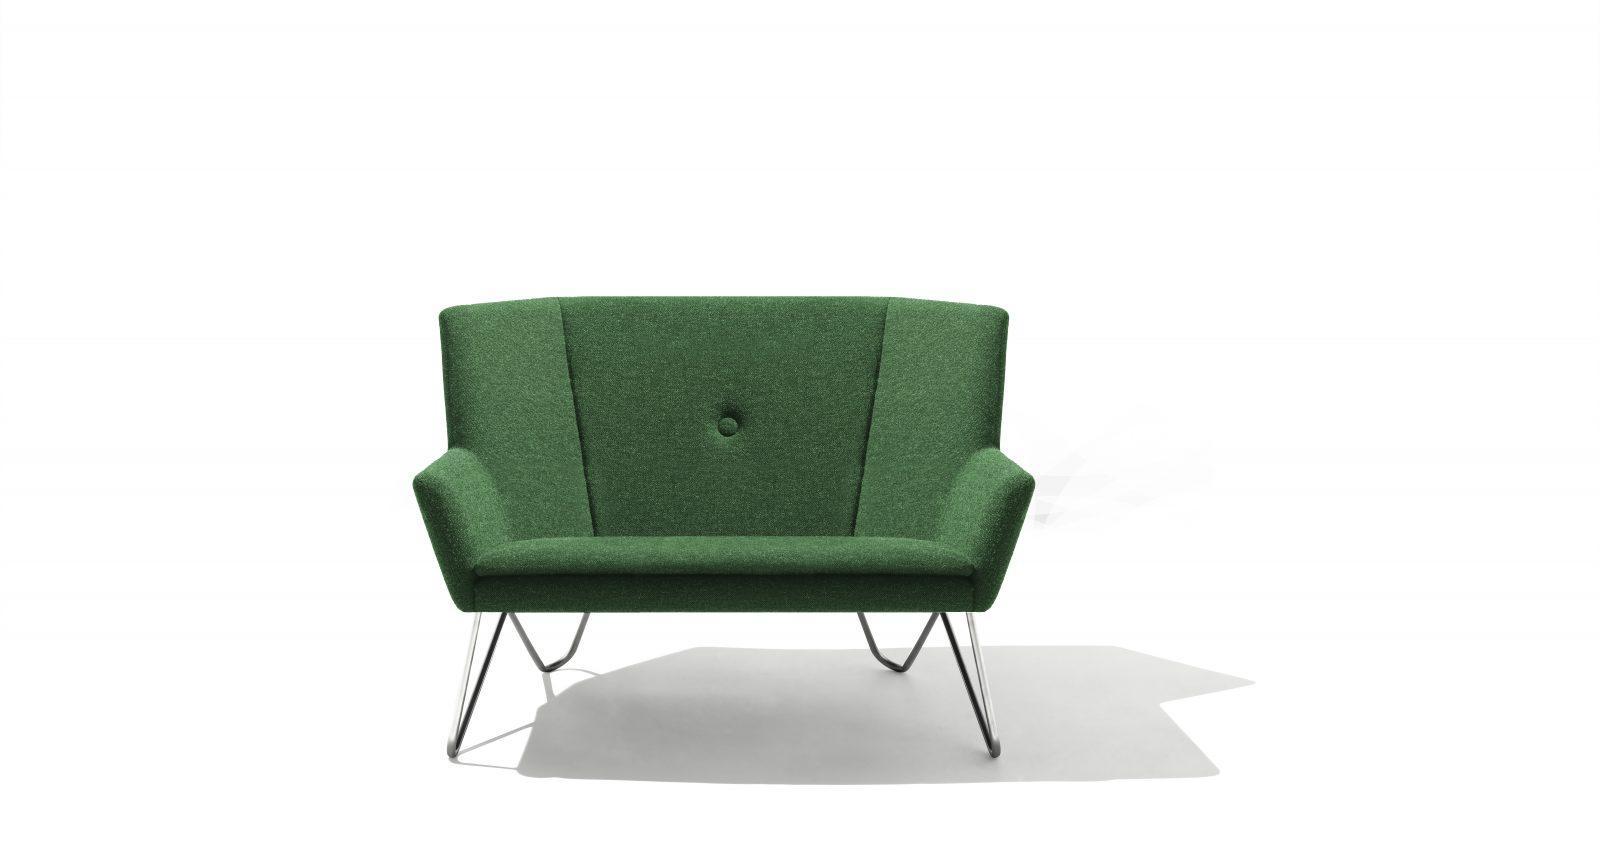 sessel skandinavisches design swedese cruiser sessel. Black Bedroom Furniture Sets. Home Design Ideas